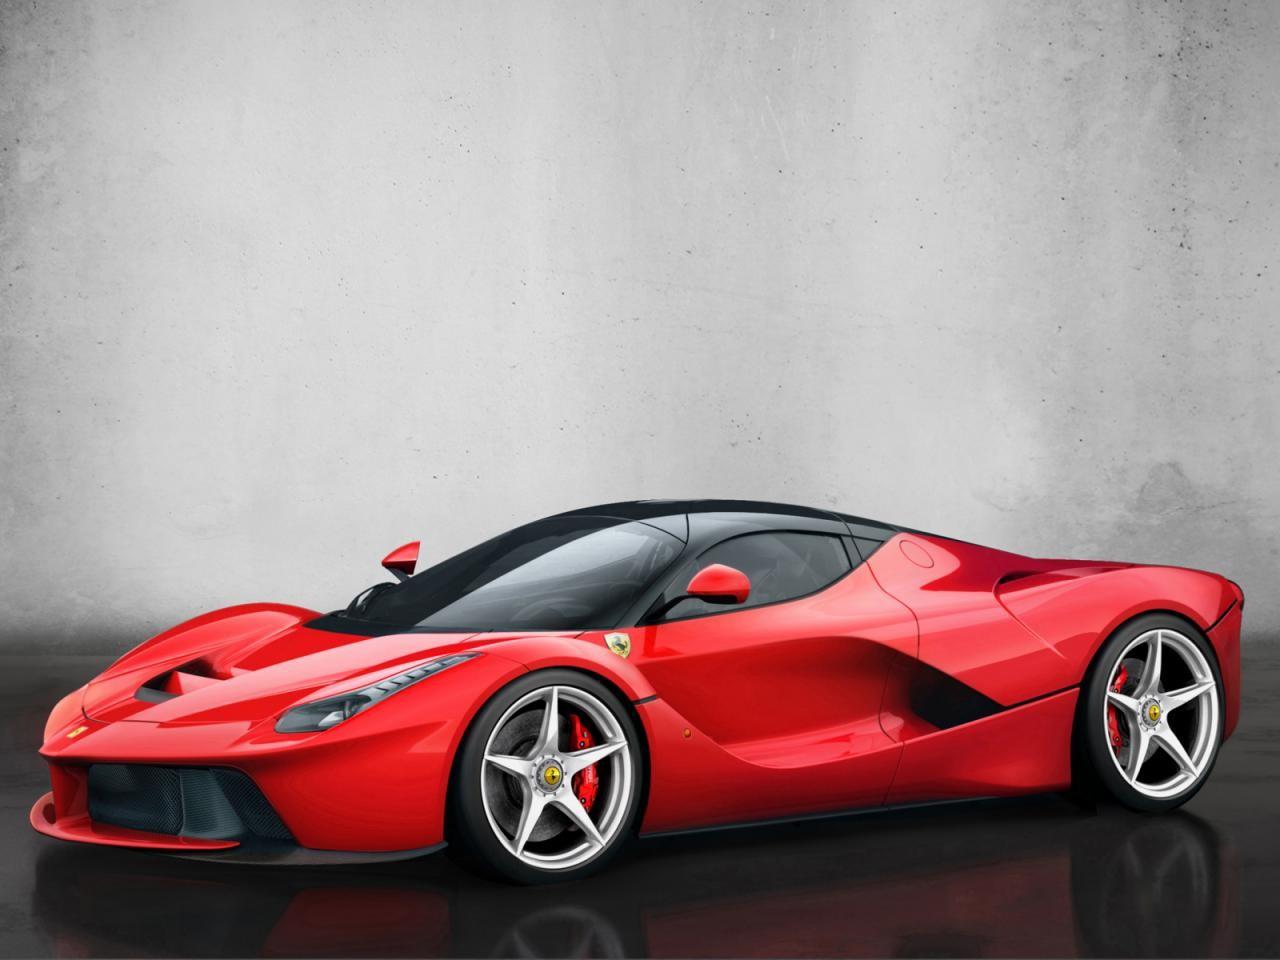 2013 LaFerrari officially revealed